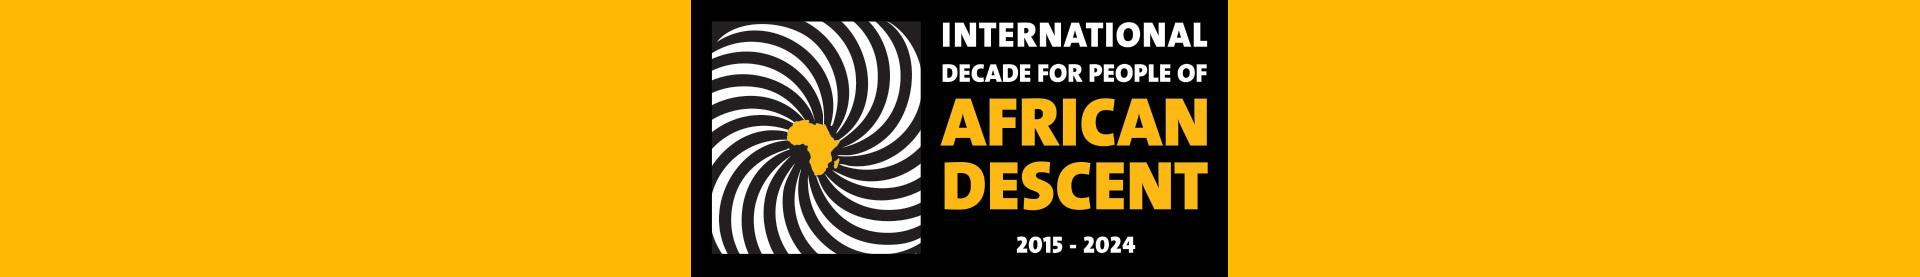 International Decade